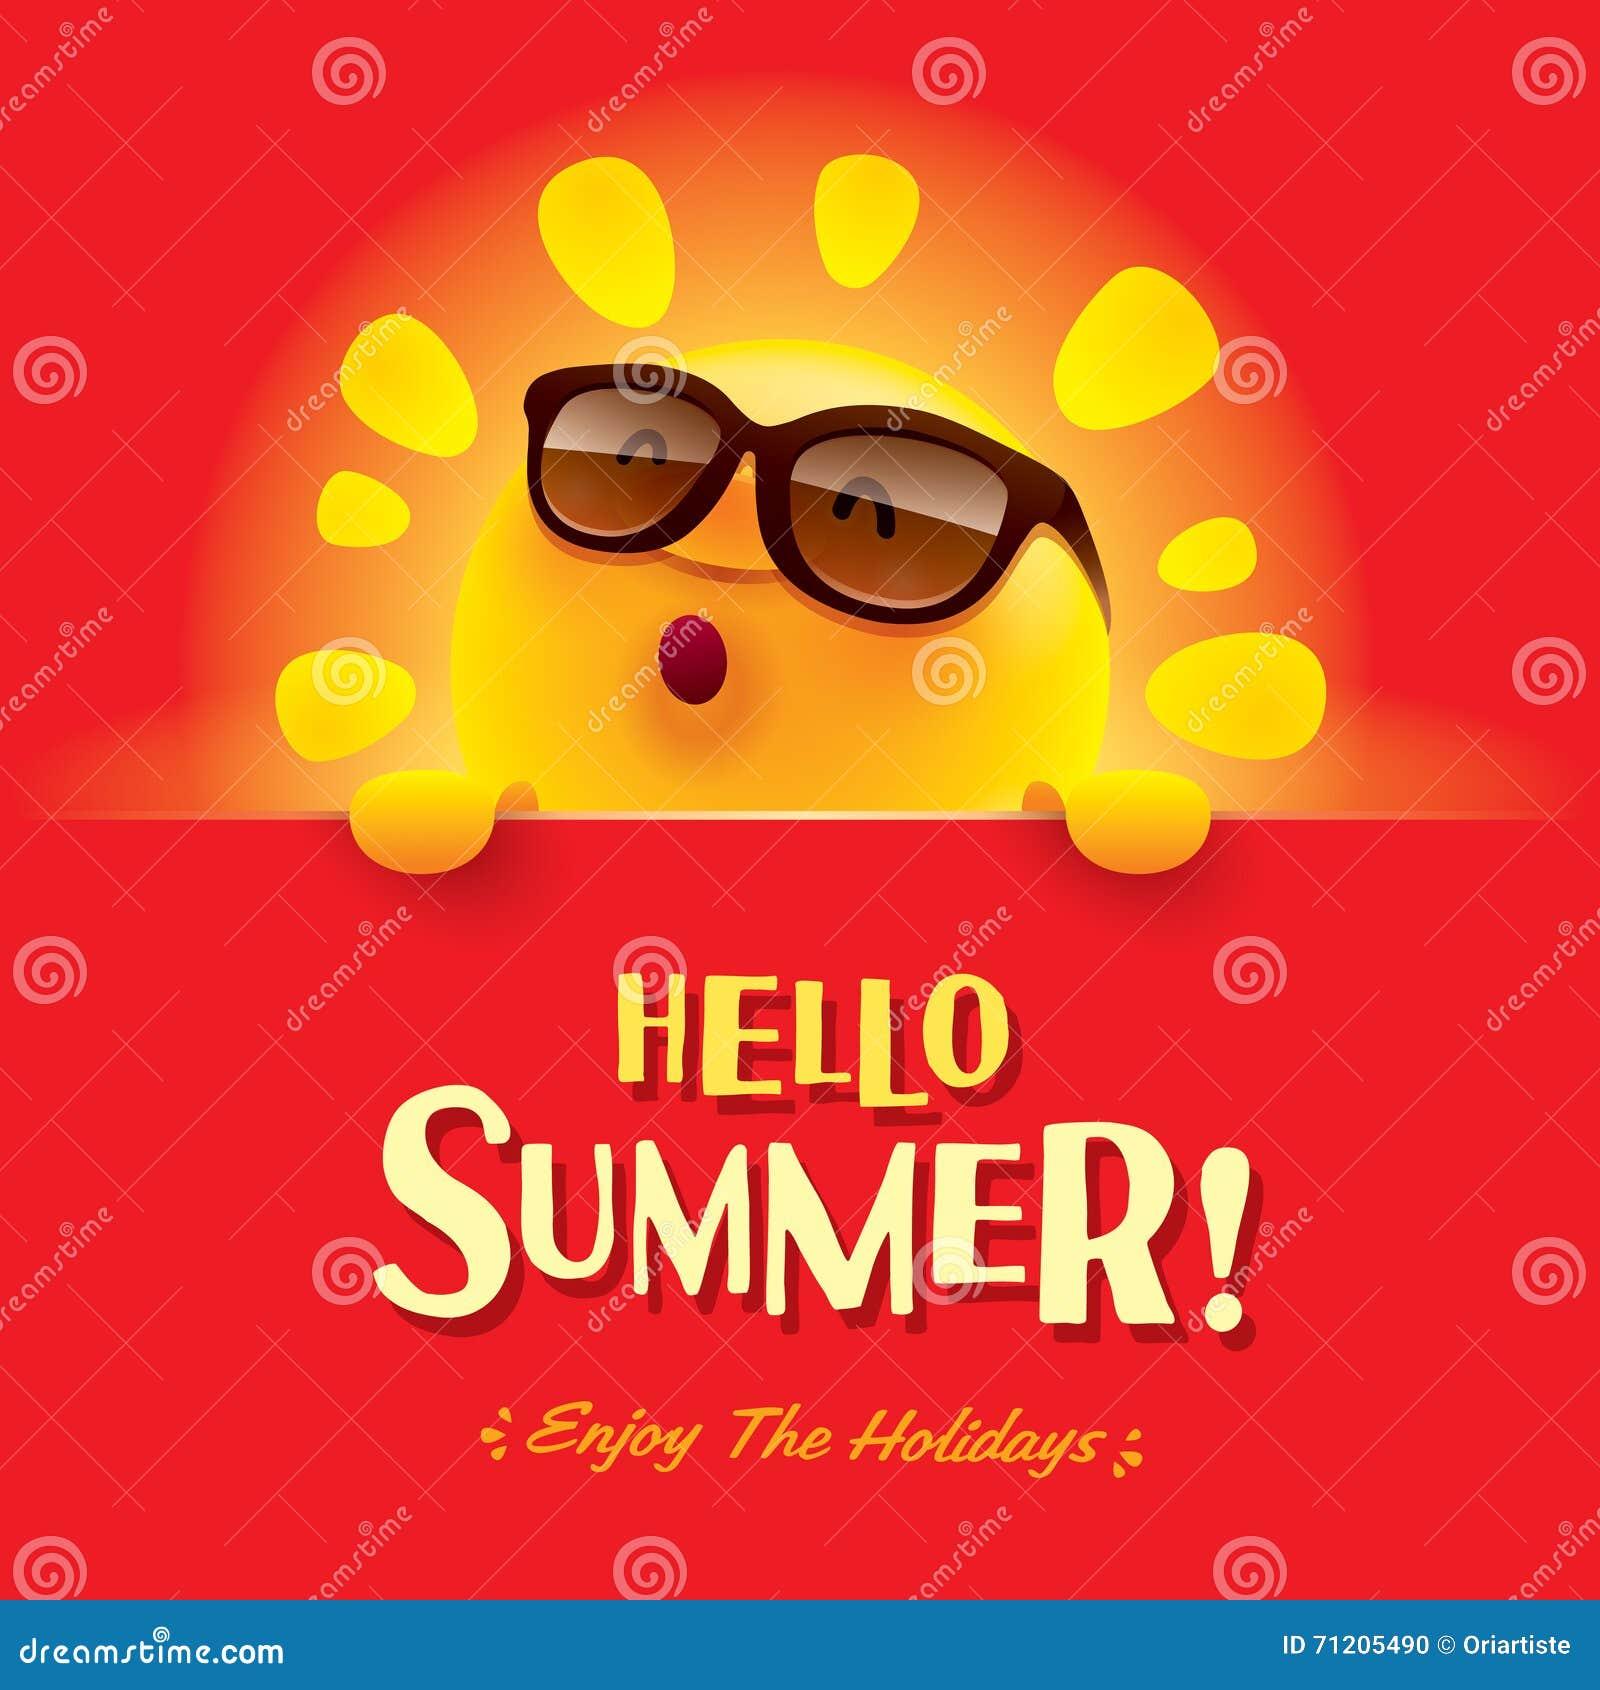 Couple Enjoying Their Summer Holidays Stock Photo: Hello Summer! Enjoy The Holidays. Stock Vector